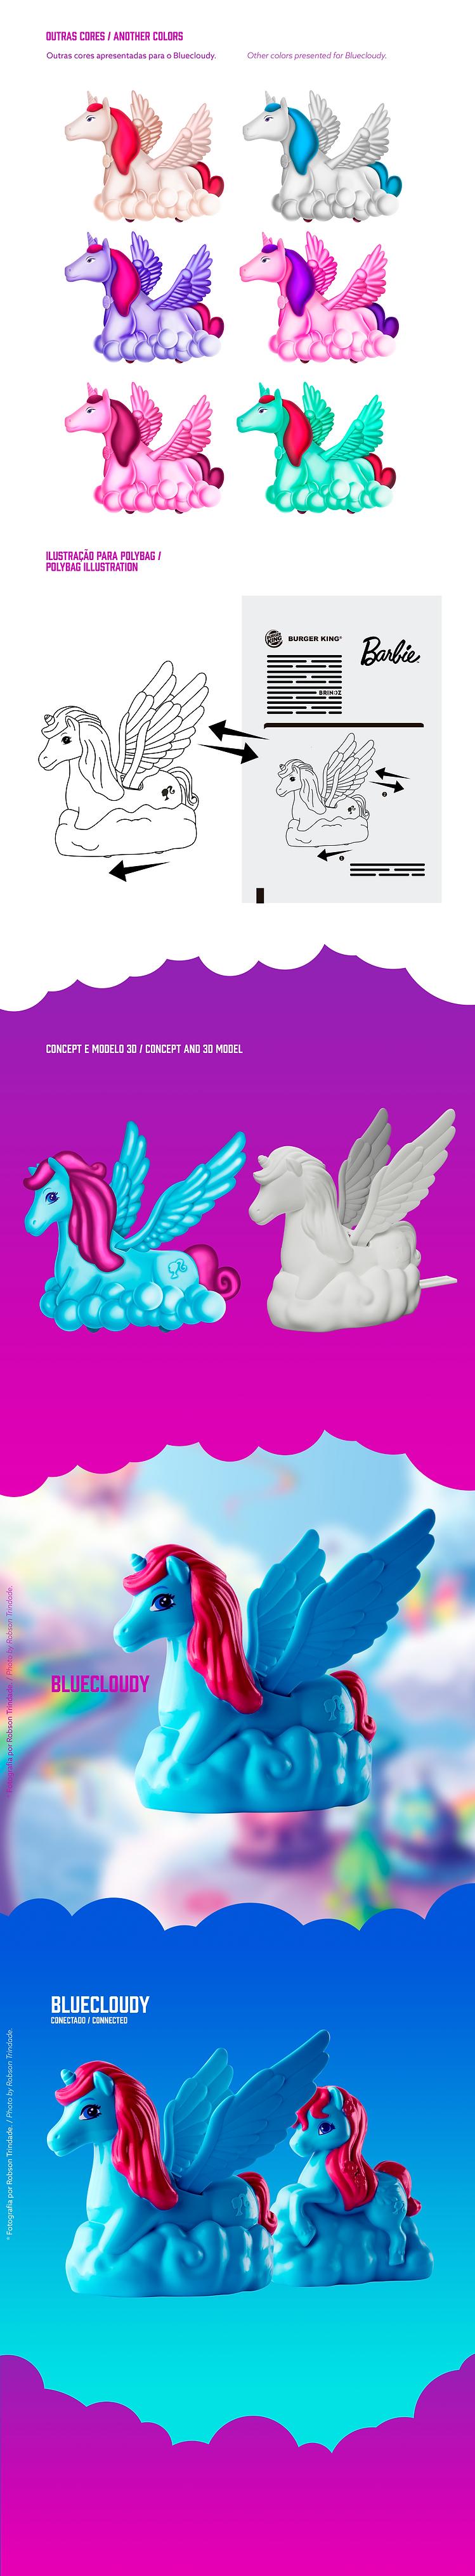 Behance---Barbie-Clouds---06B.png